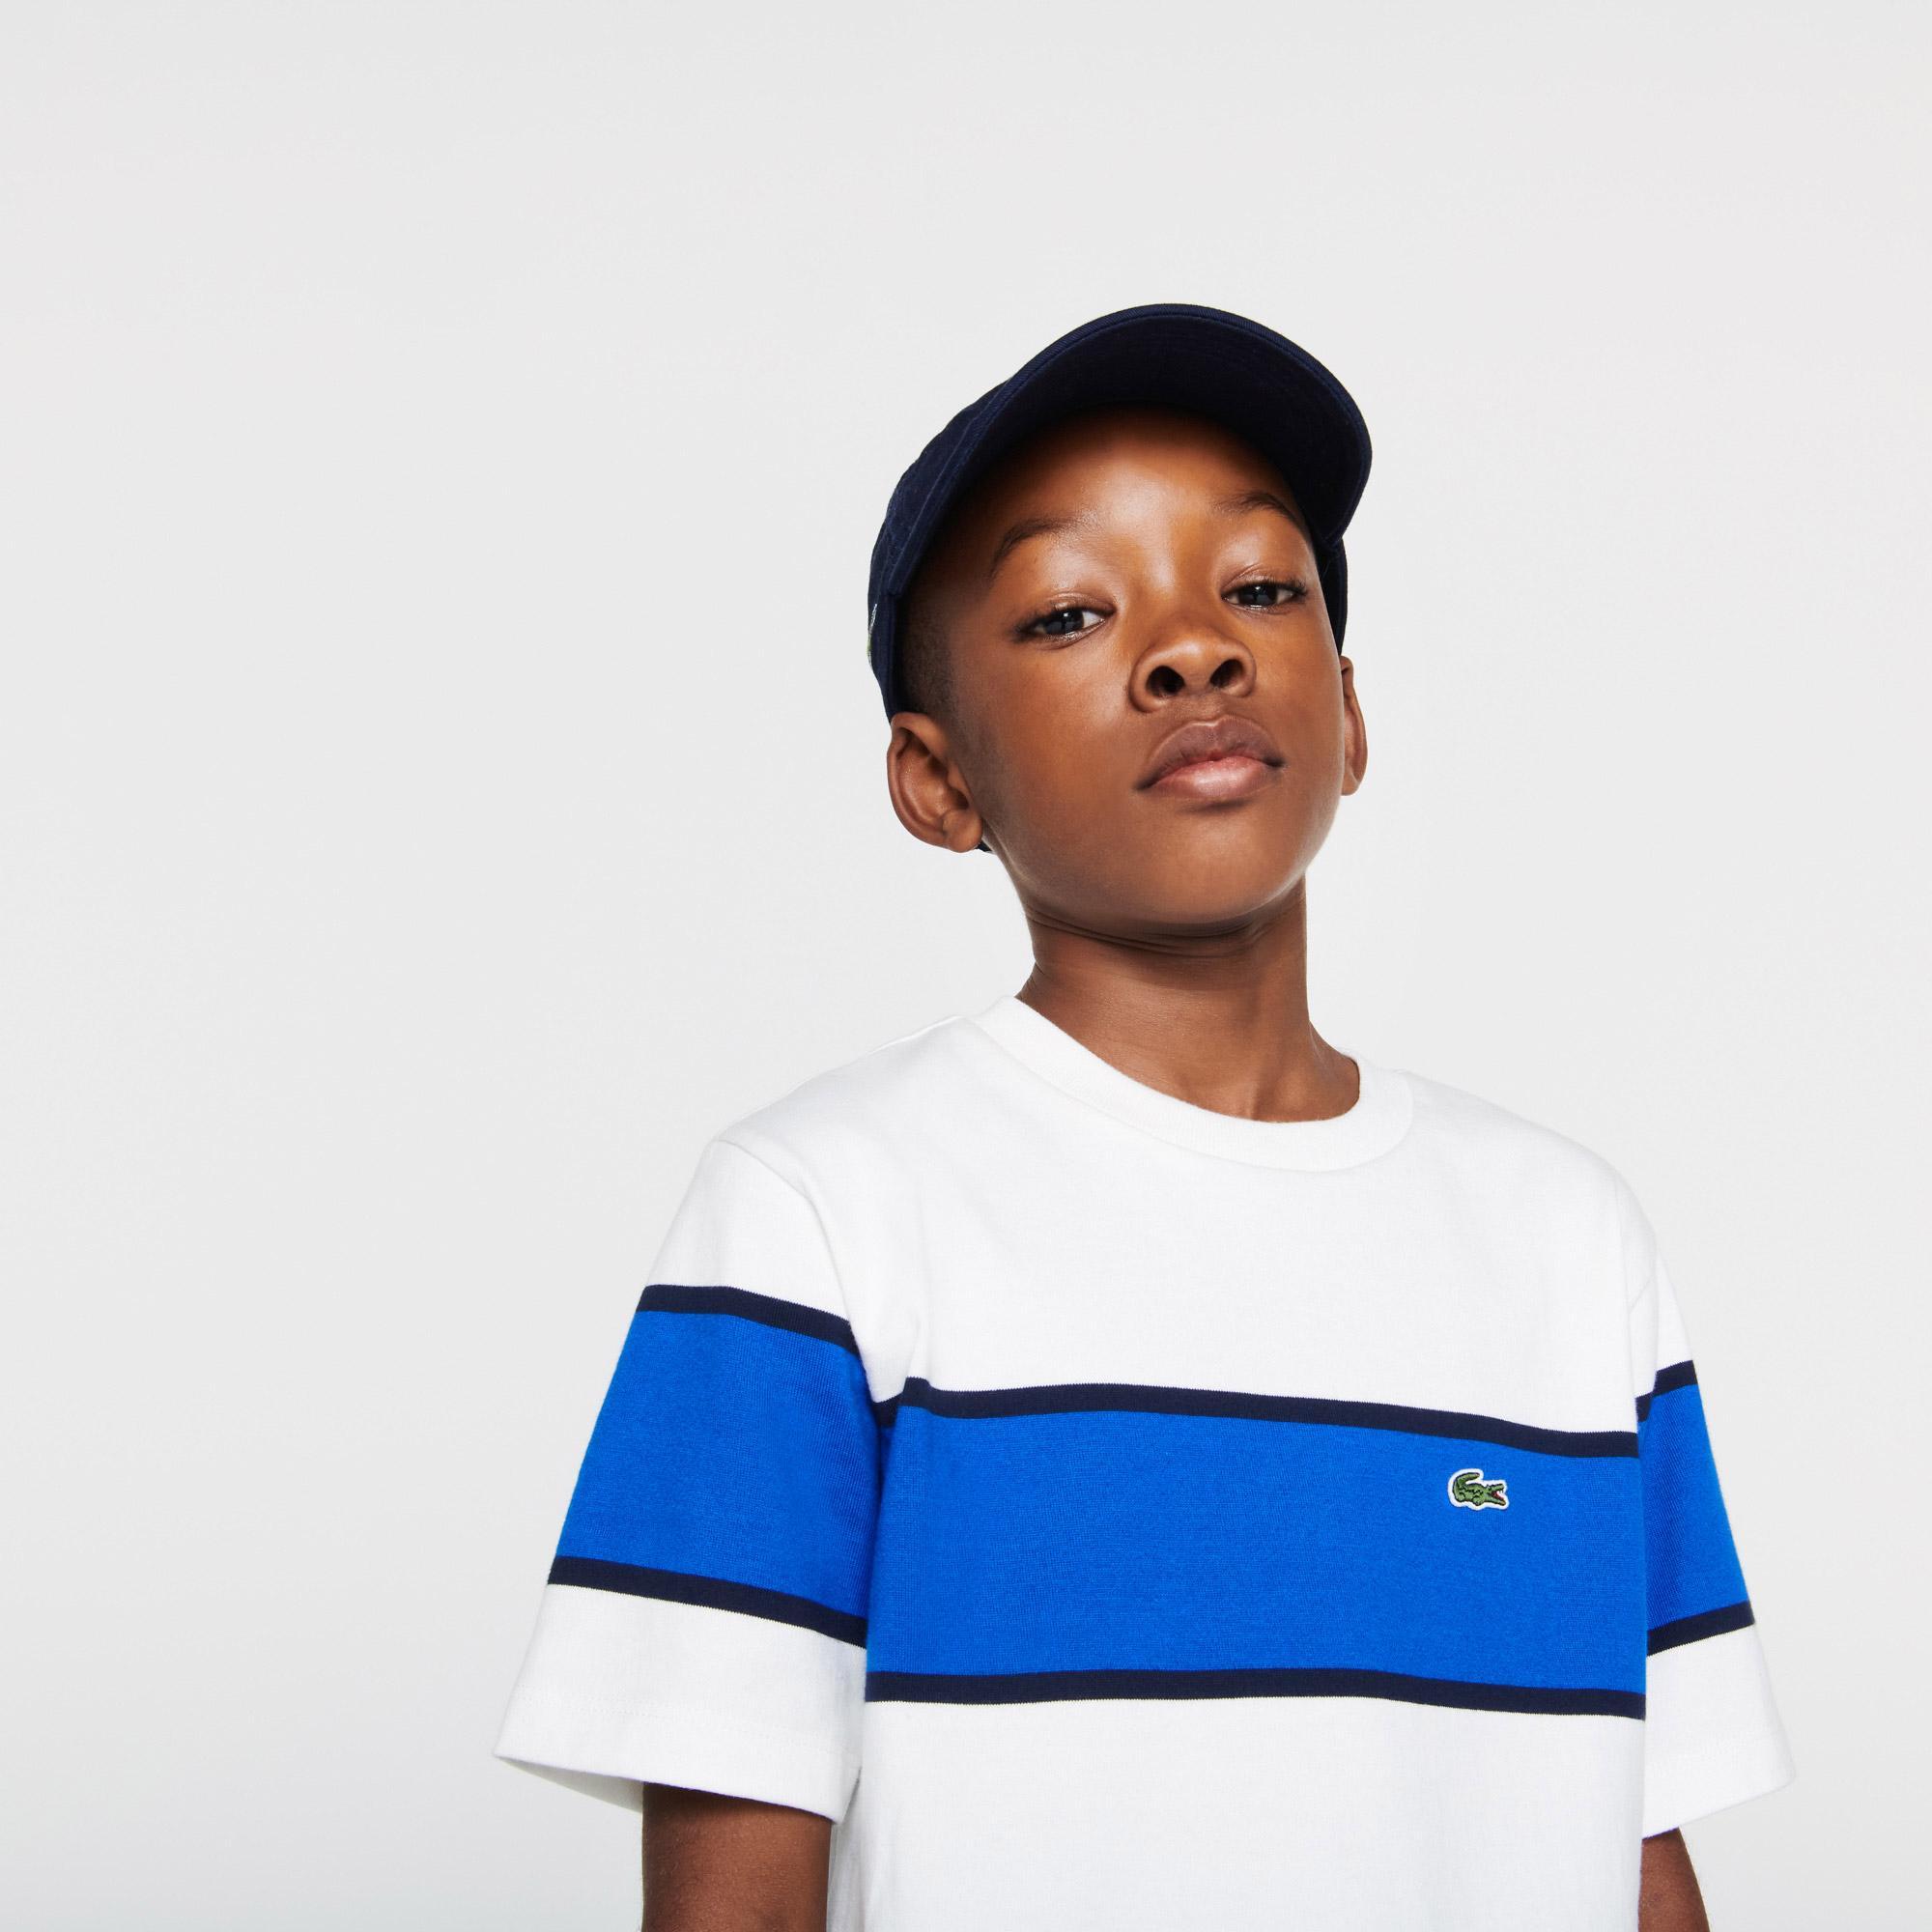 Lacoste Çocuk Bisiklet Yaka Renk Bloklu Beyaz - Lacivert T-Shirt